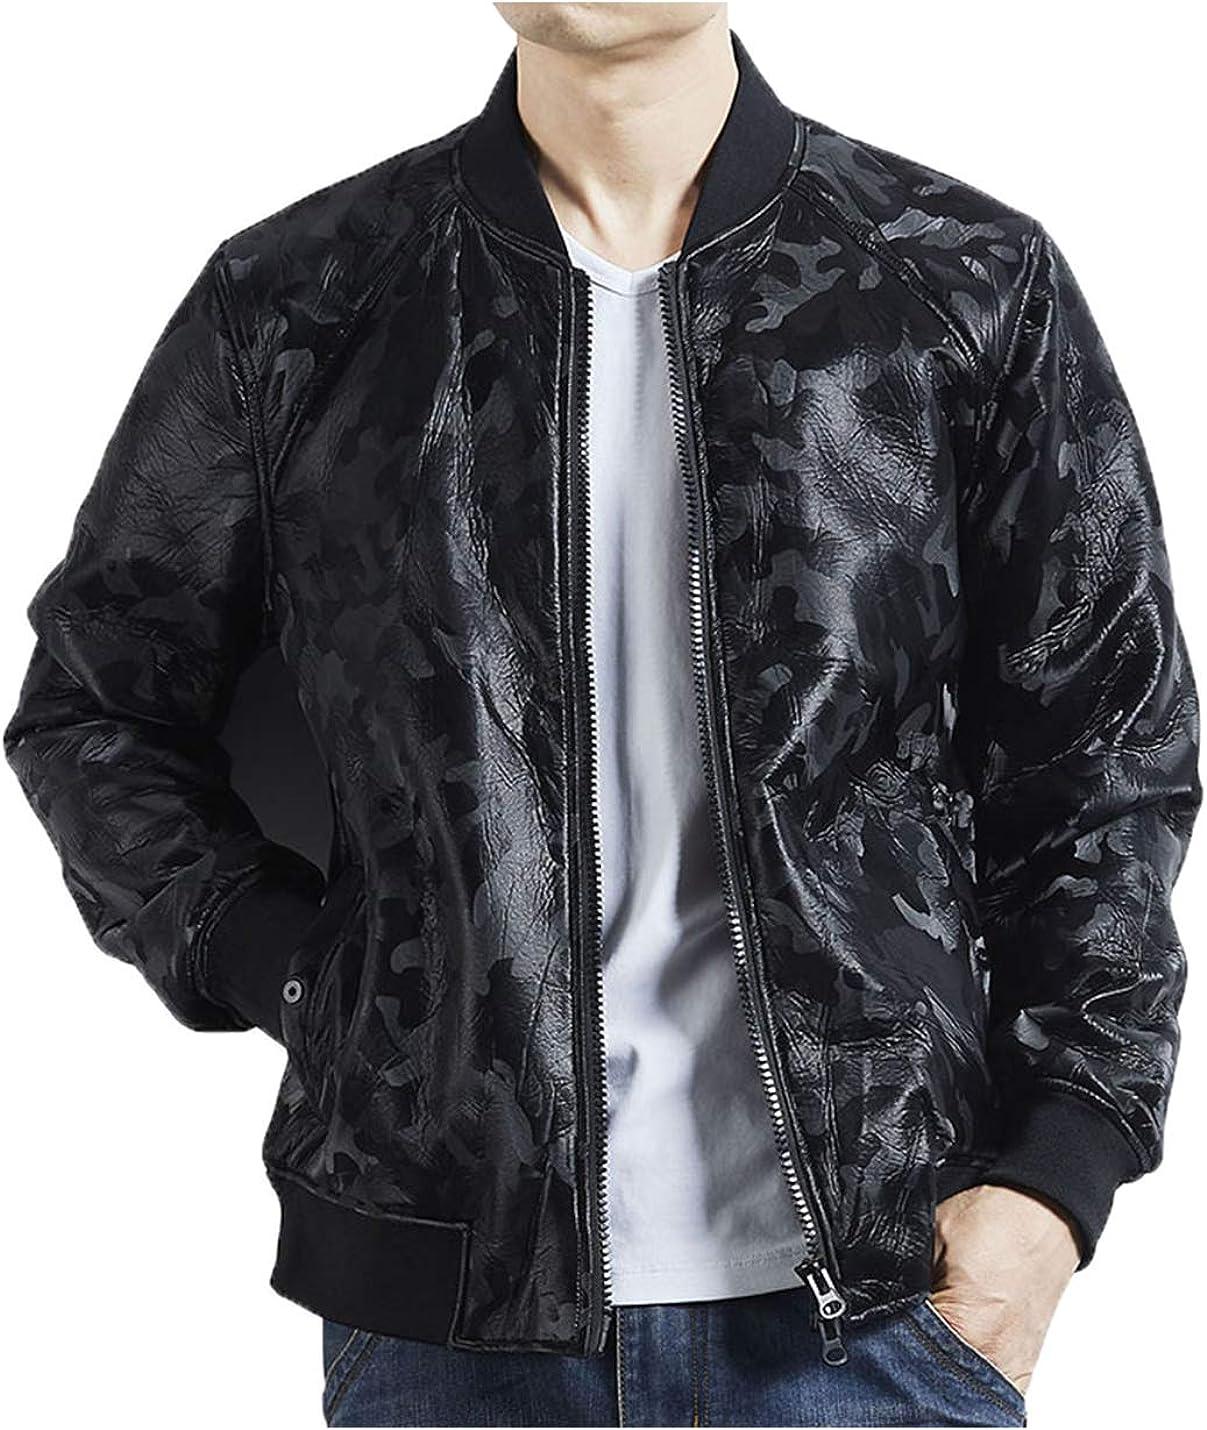 PAODIKUAI Men's Olive Camo Print Black Faux Leather Bomber Jacket Sports Zip Jacket